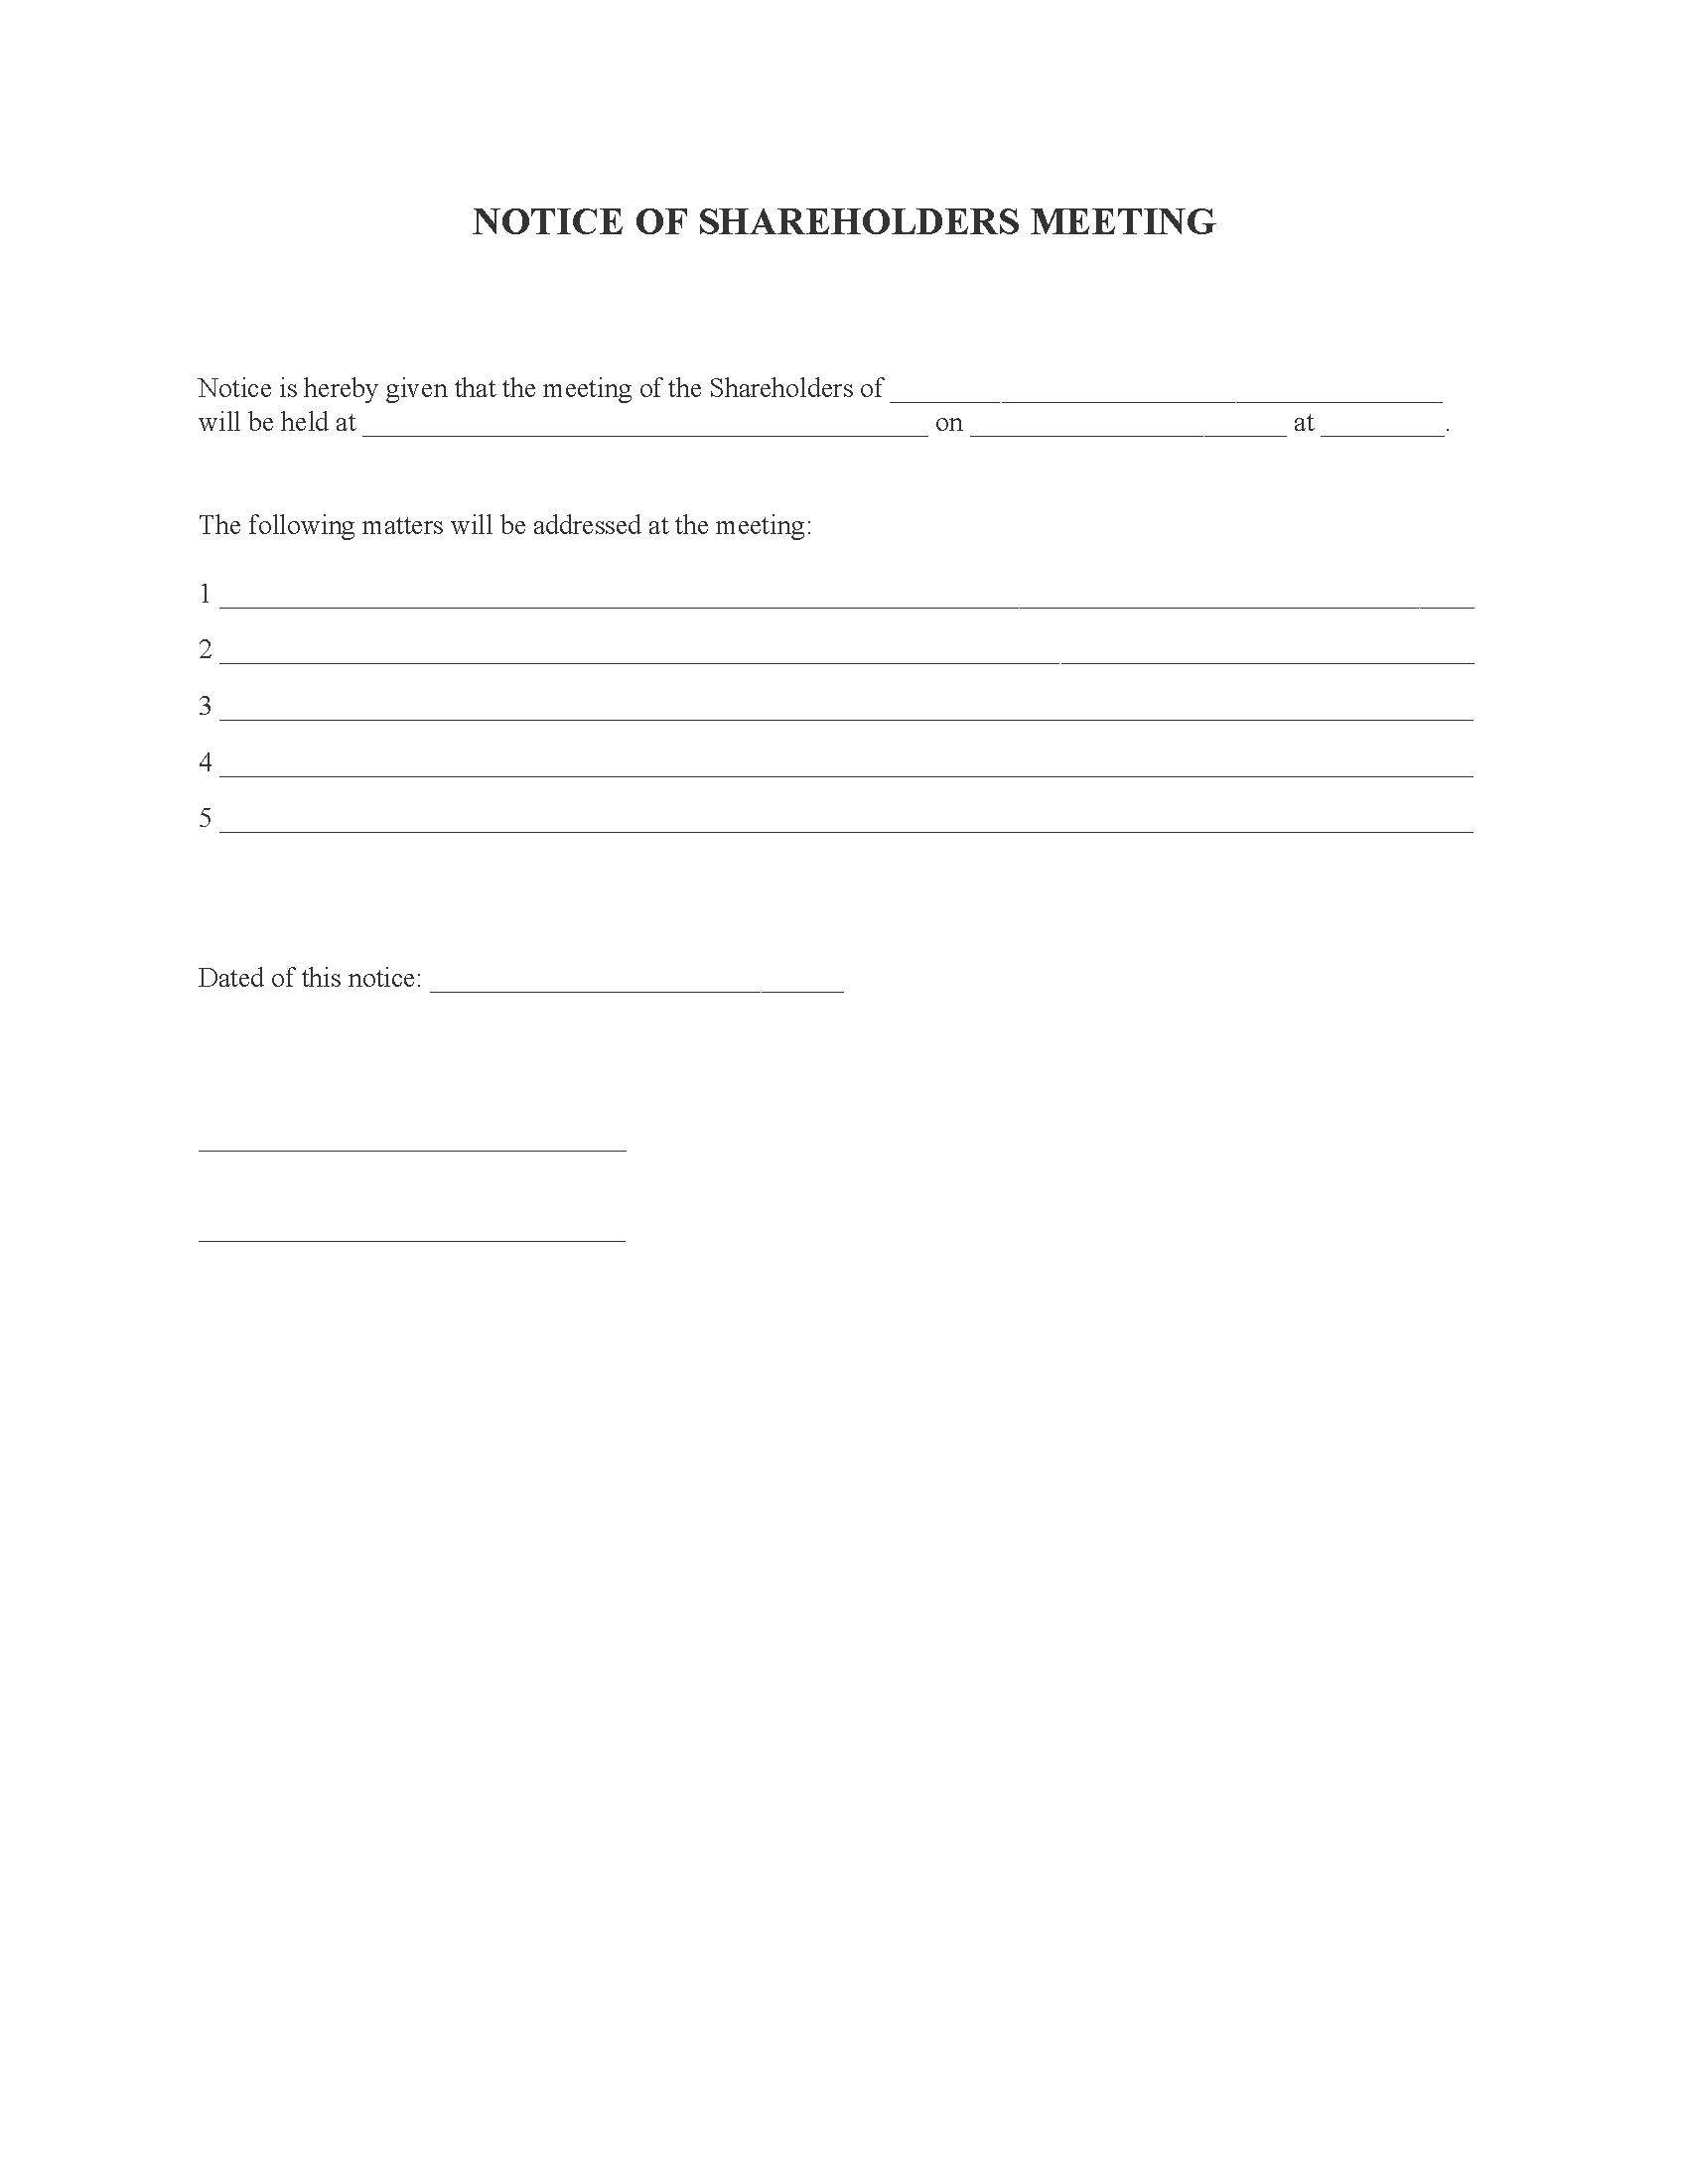 Notice of Shareholders Meeting